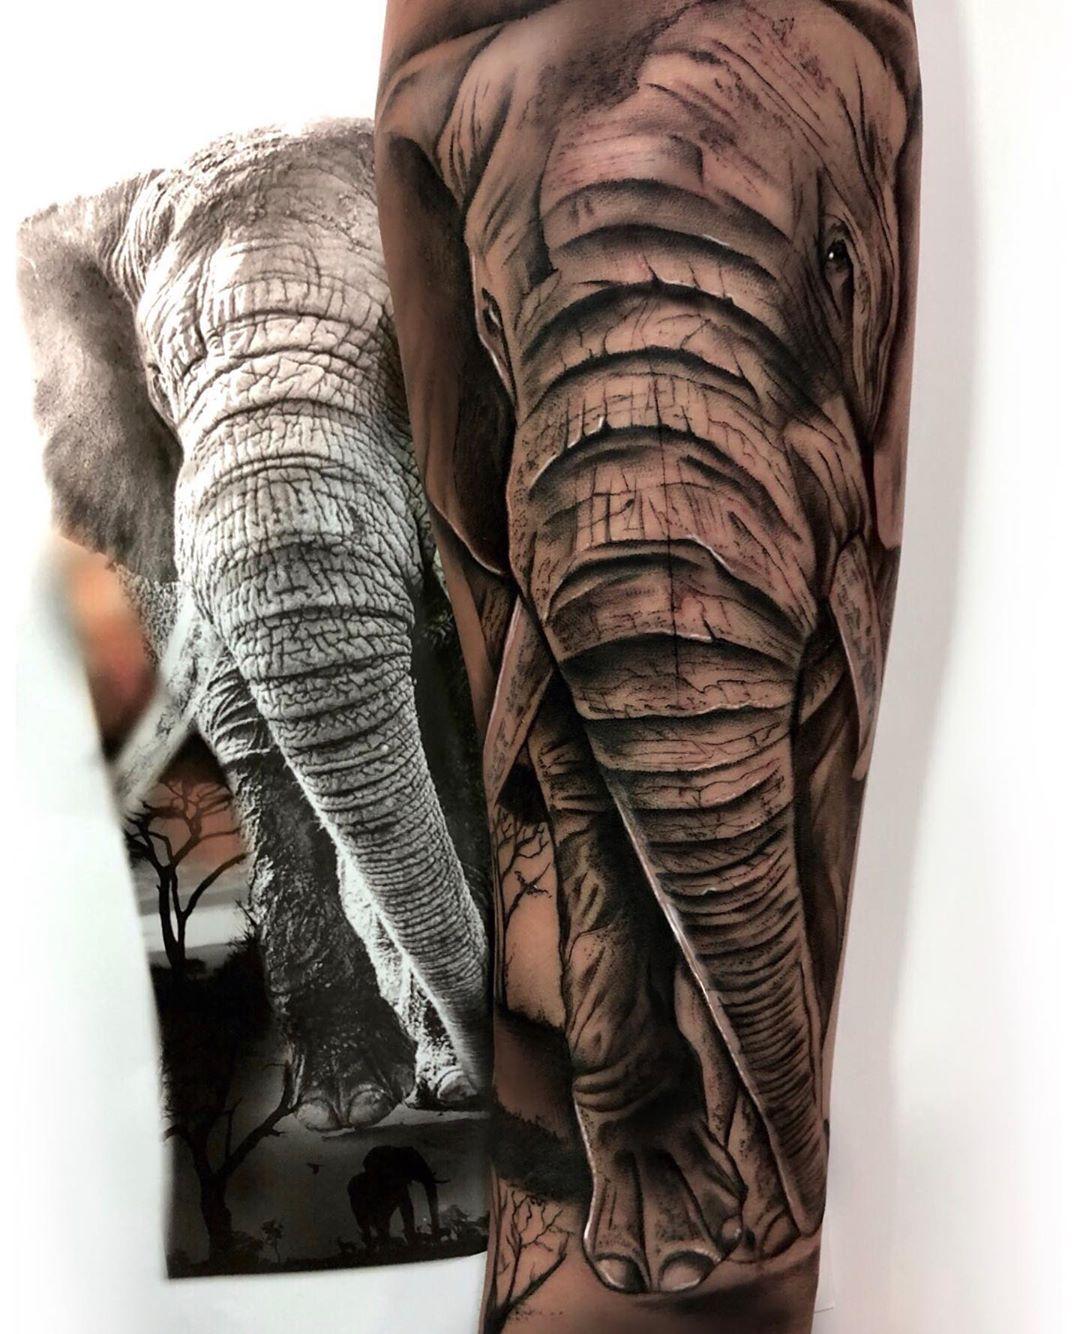 followforfollow,berlin,followmeciudadreal,ciudadreal,tomelloso,almagro,puertollano,tatuajesenpuertollano,tatuajesendaimiel,ciudadrealtattoo,ciudadrealtatuajes,tatuajesciudadreal,puertollano,tattooers,ink,tatuajes,realismo,realistictattoo,ciudadrealtattoo,tatuajesenpuertollano,traditionaltattoos,castillalamancha,ink,tattooart,zurichtattoo,daimiel,inkedgirls,inkig,ink,inktattoos